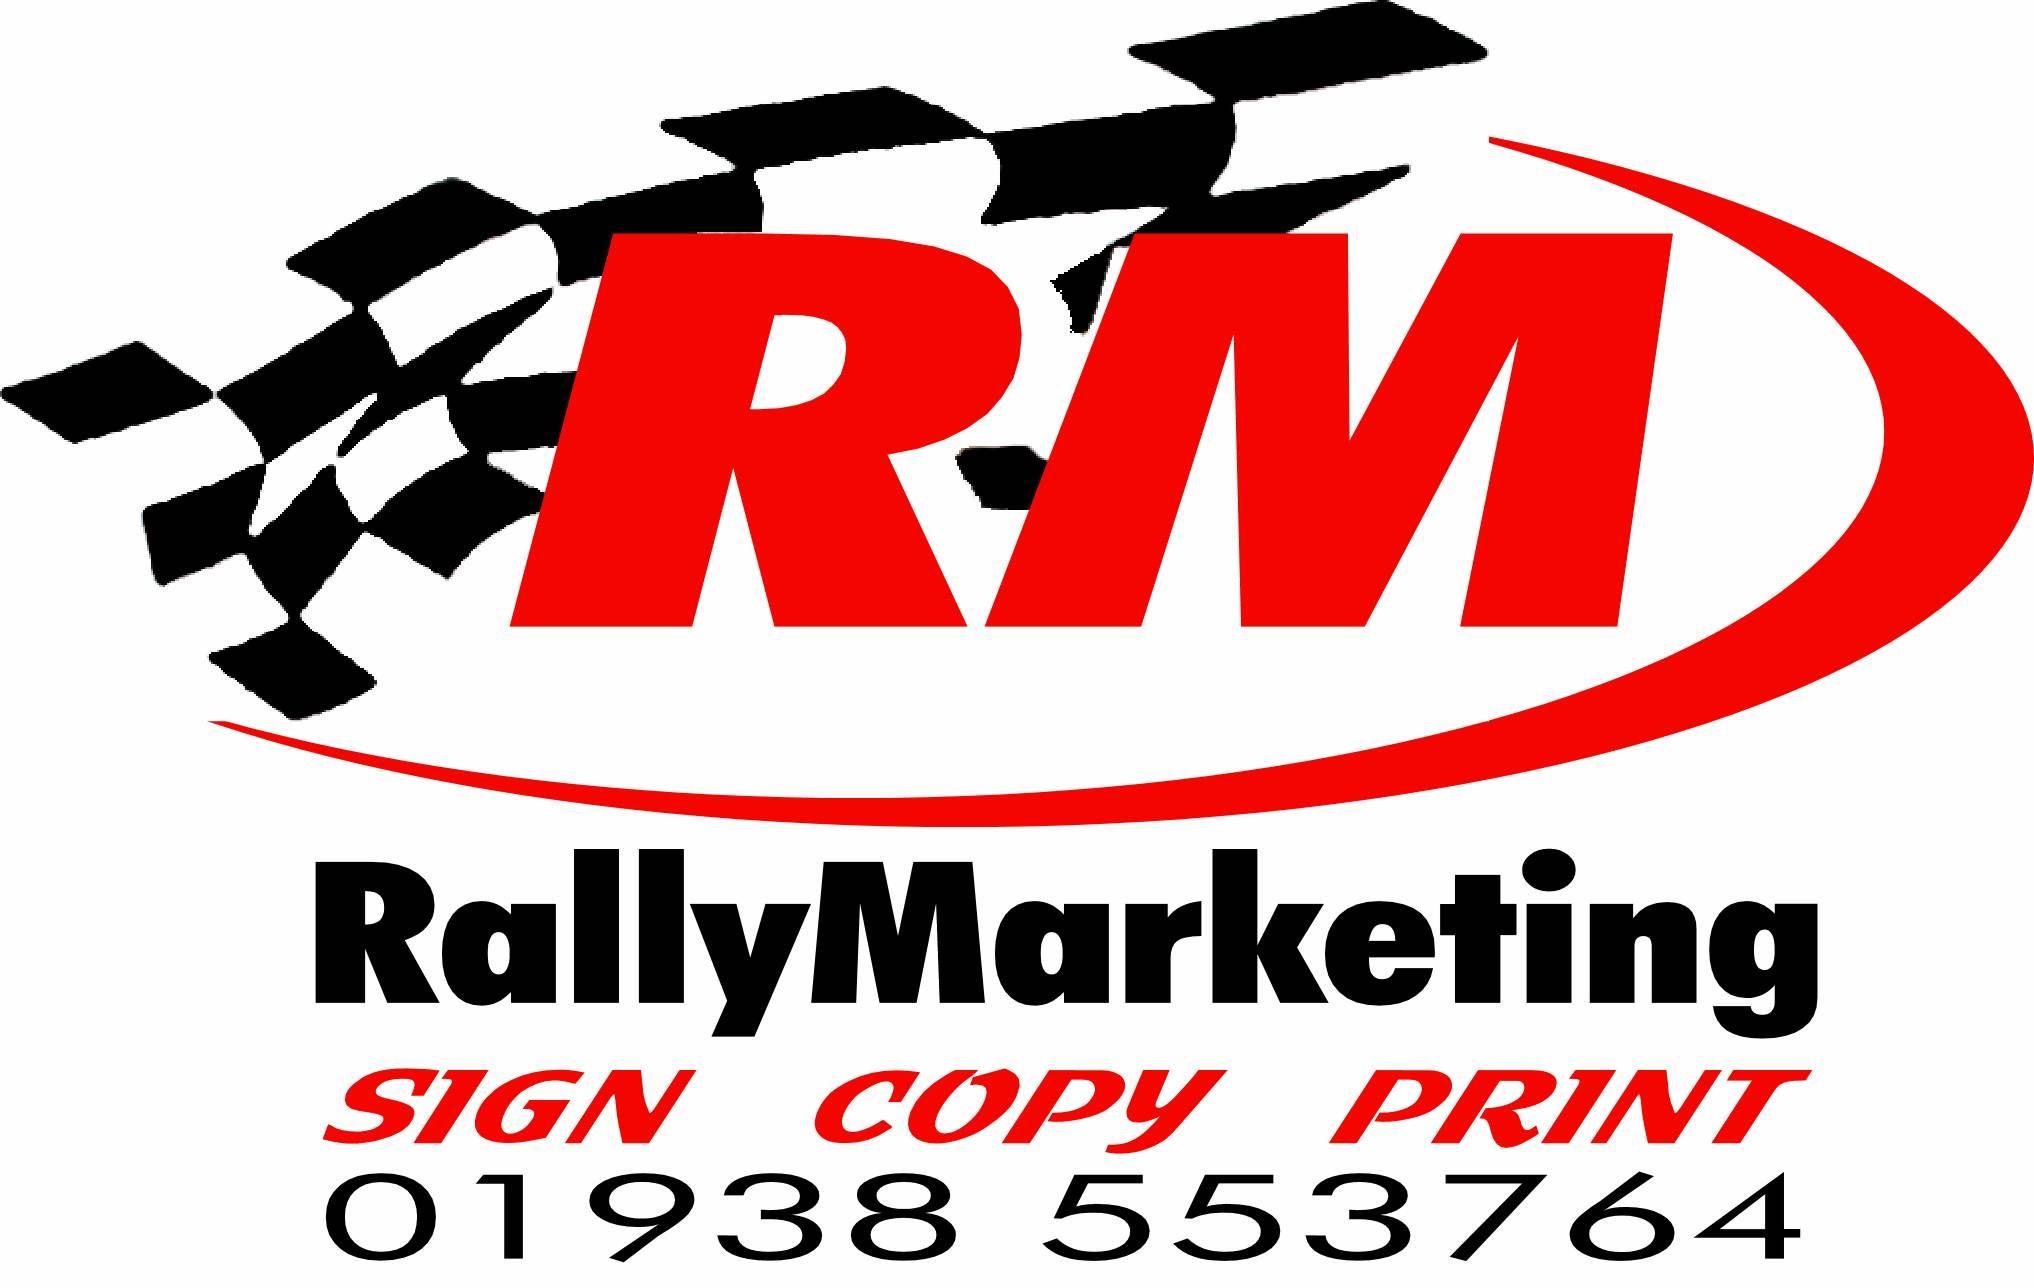 rallymarking